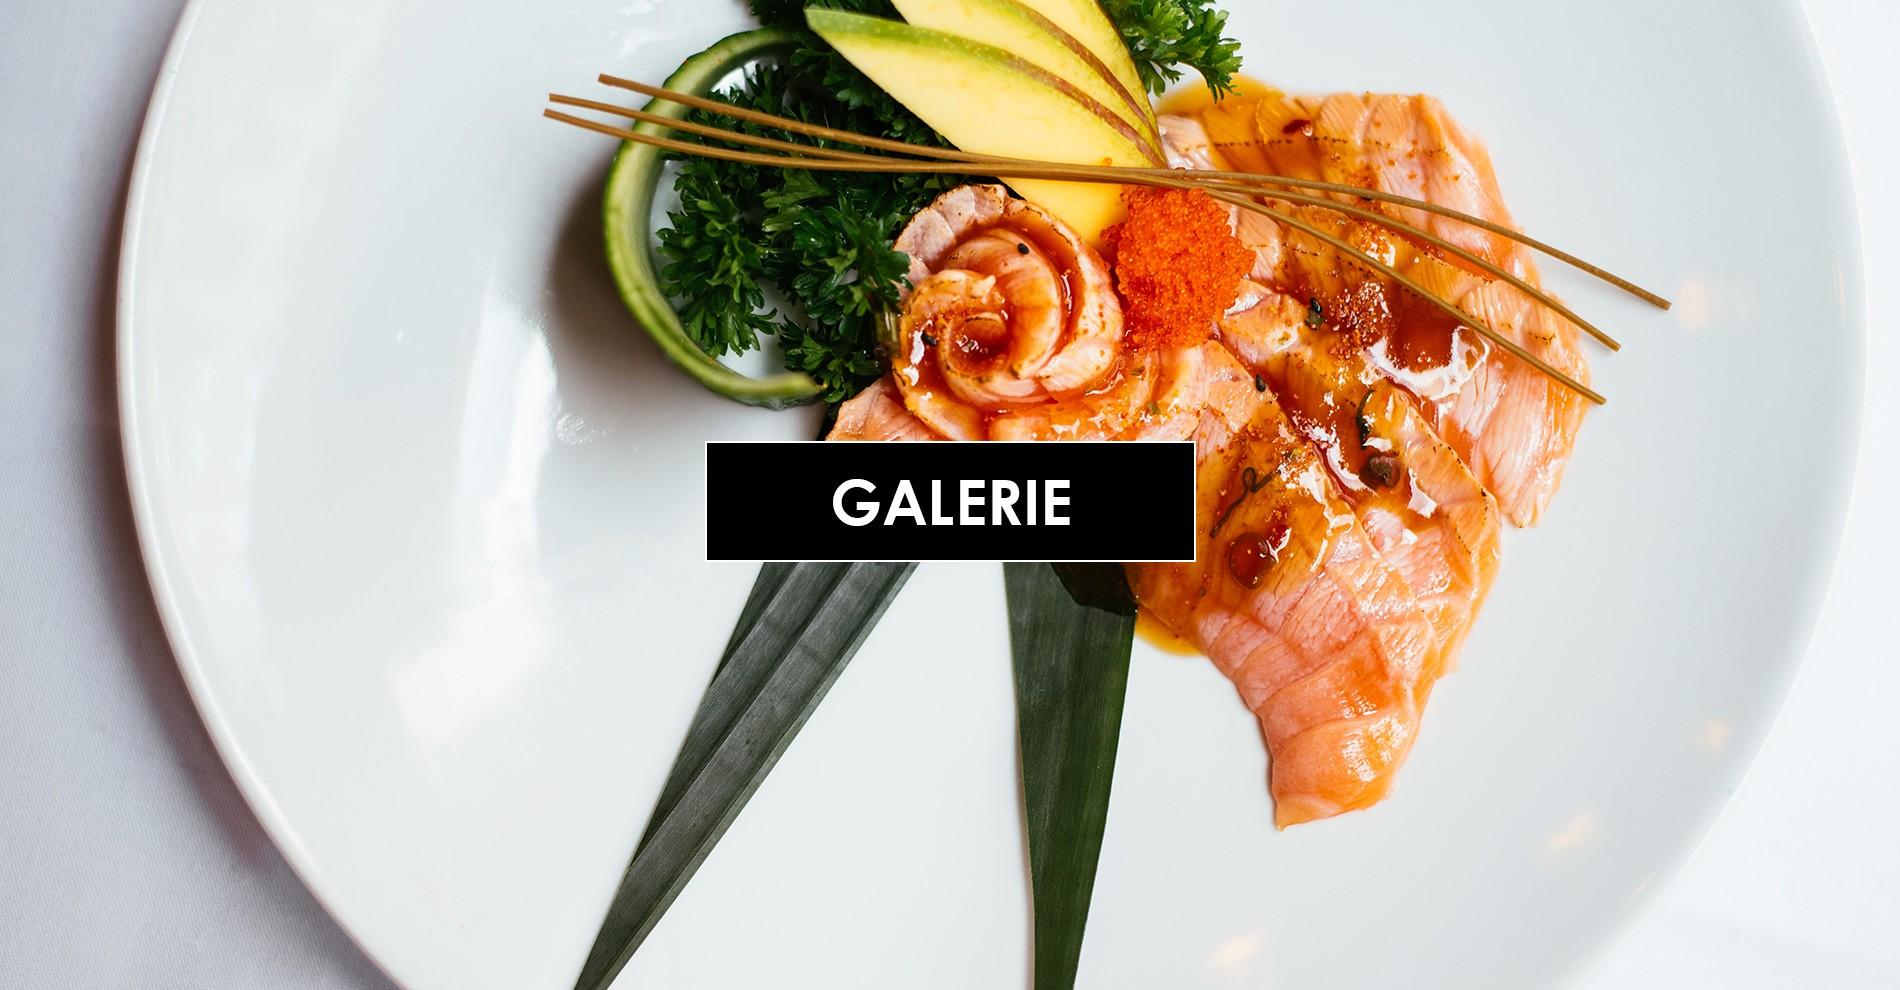 Galerie Galerie Fr